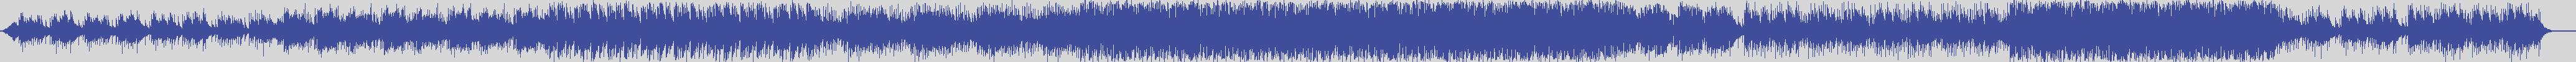 worldwide_music_records [WMR004] Max Riolo - Careless Au Reveil [Original Mix] audio wave form